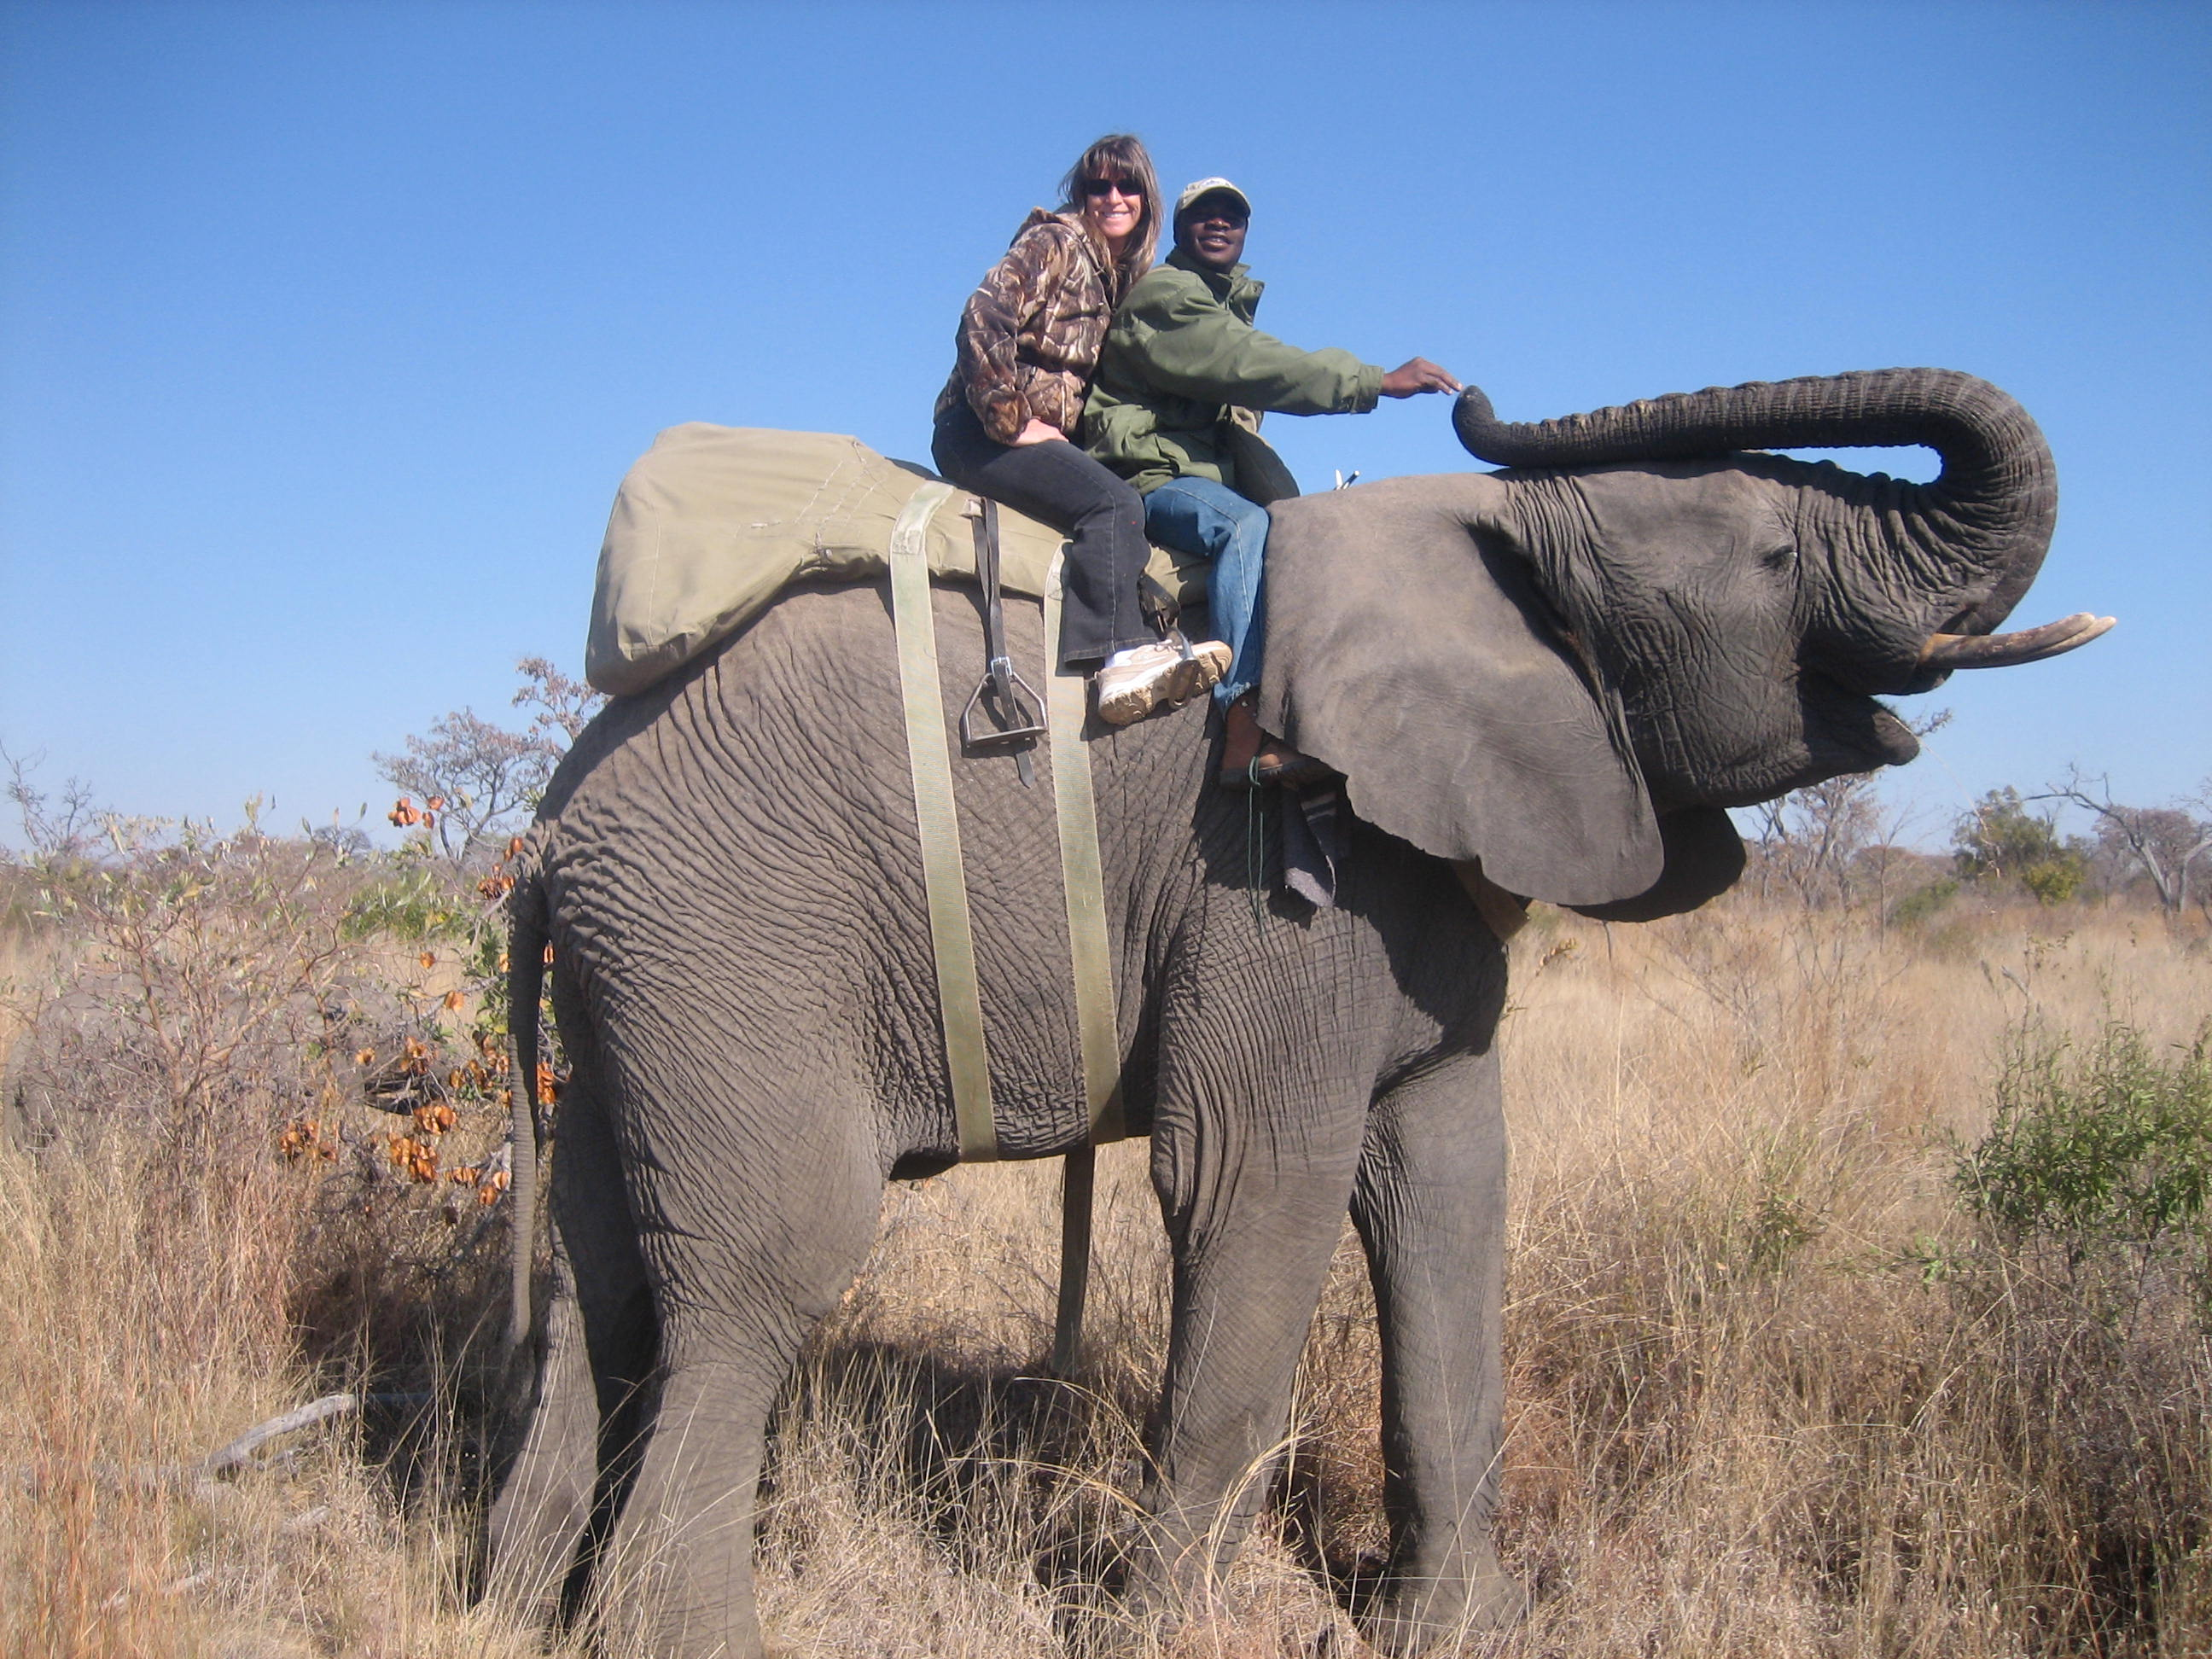 Africa 2009 307.jpg